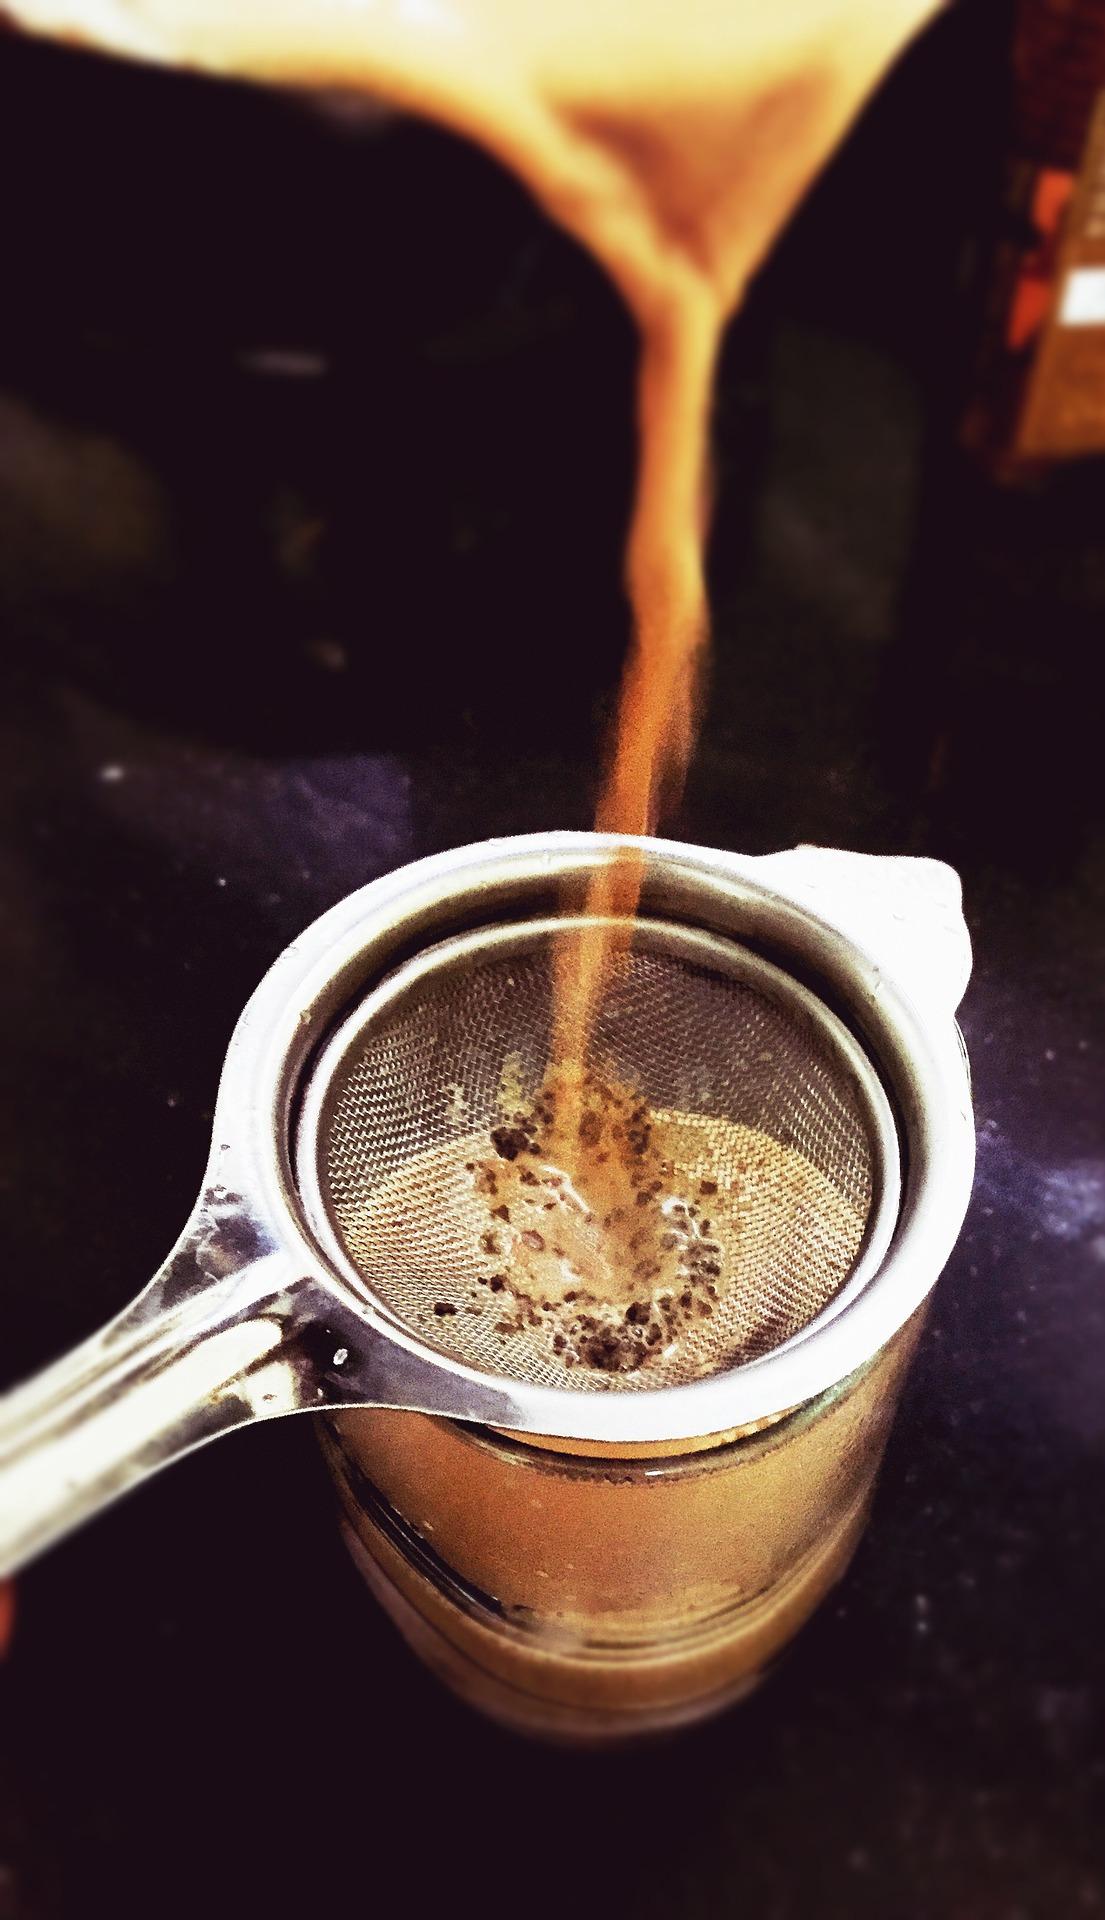 cup-932303_1920.jpg